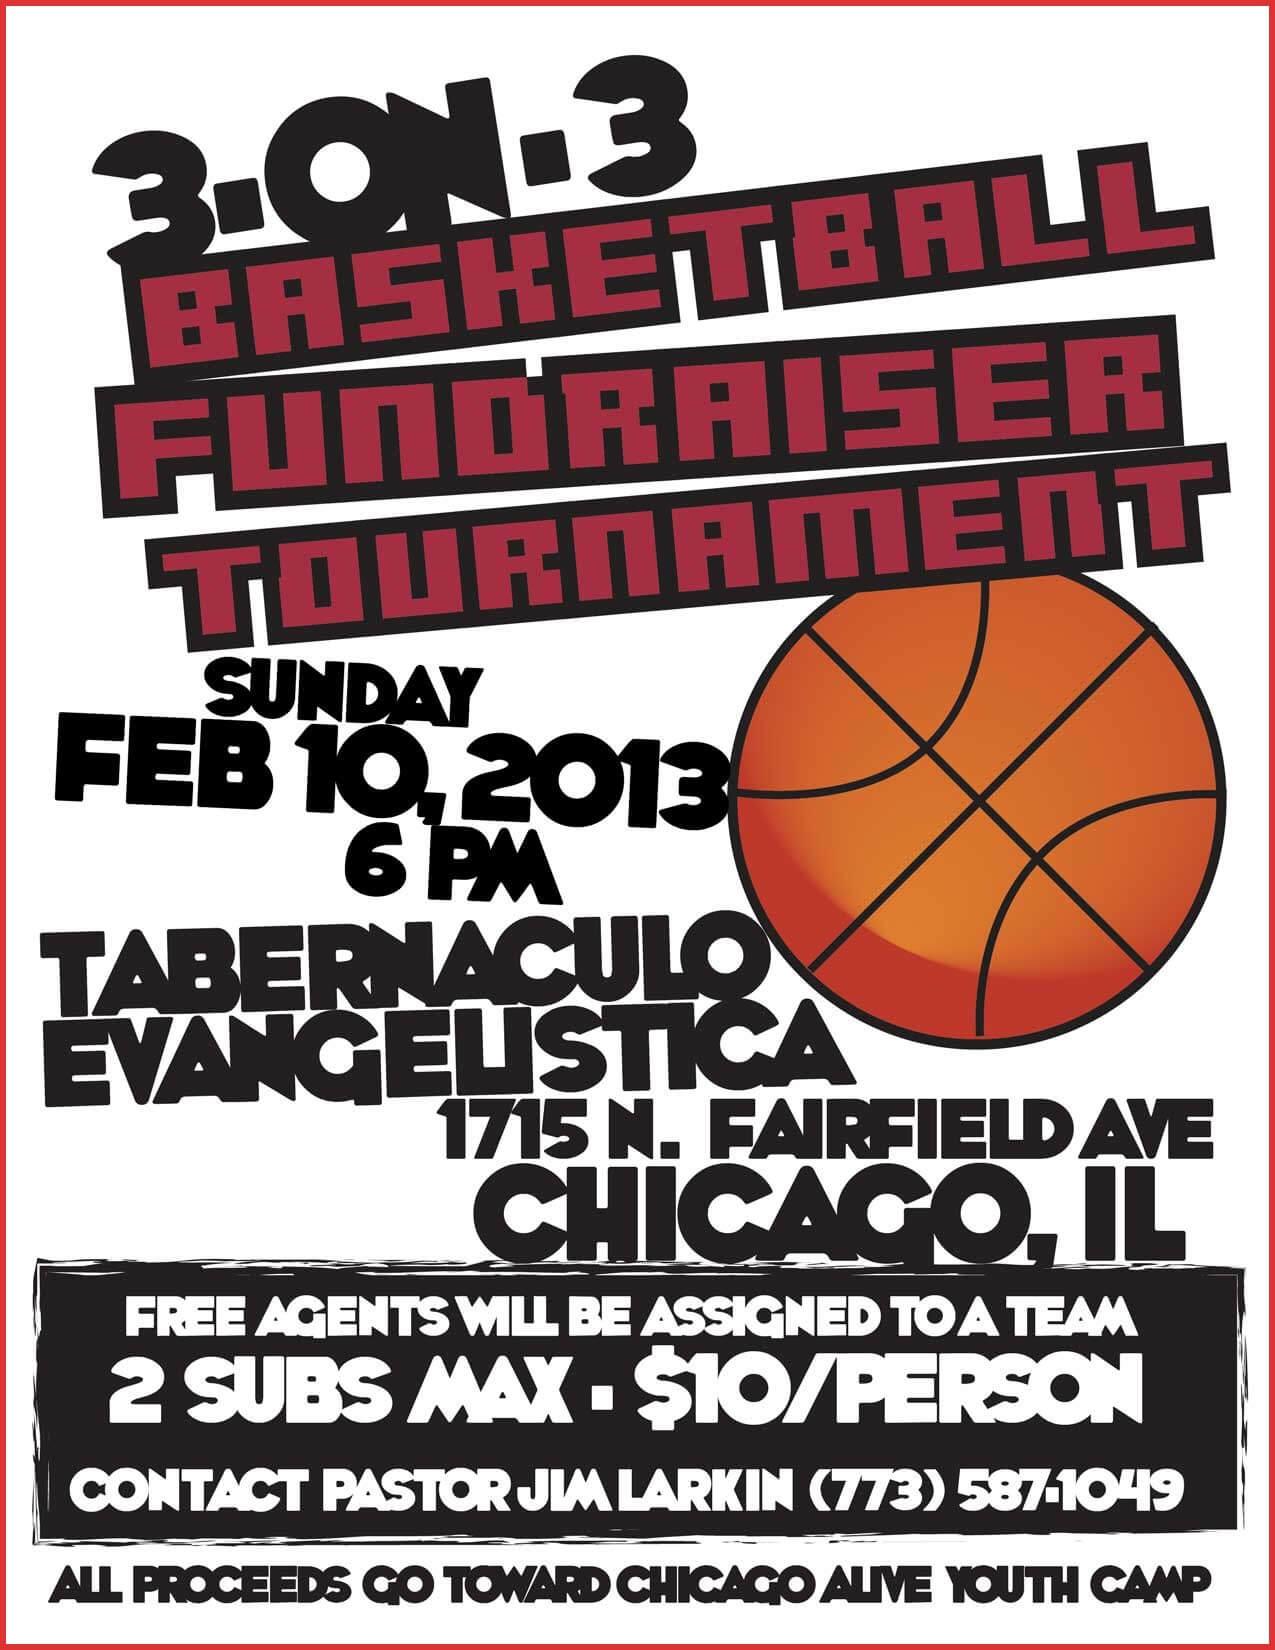 030 Basketball Tournament Flyer Template Free Ideas On With Regard To Basketball Tournament Flyer Template